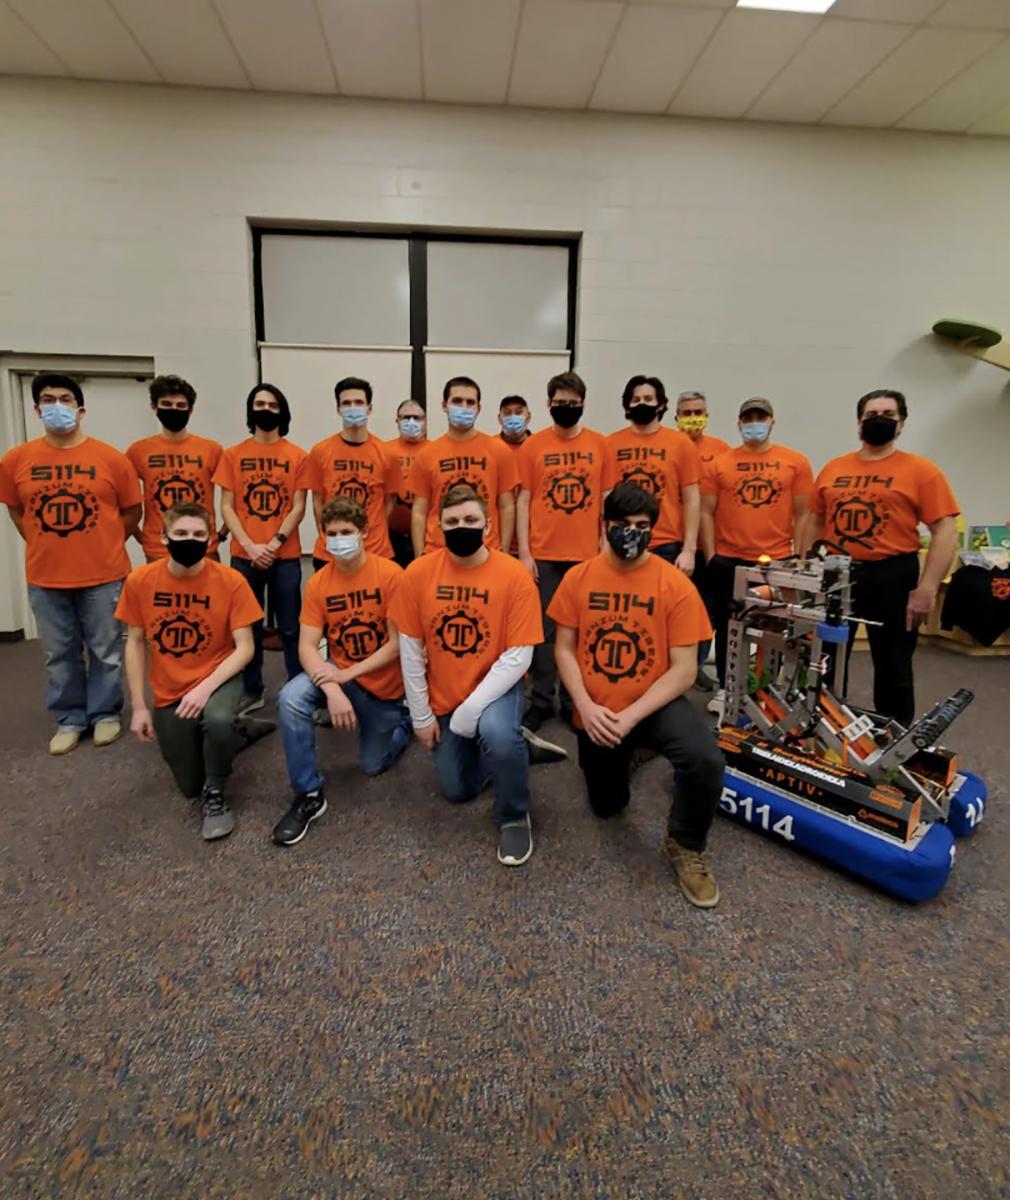 2-14 - adam hartleys column on robotics team.png